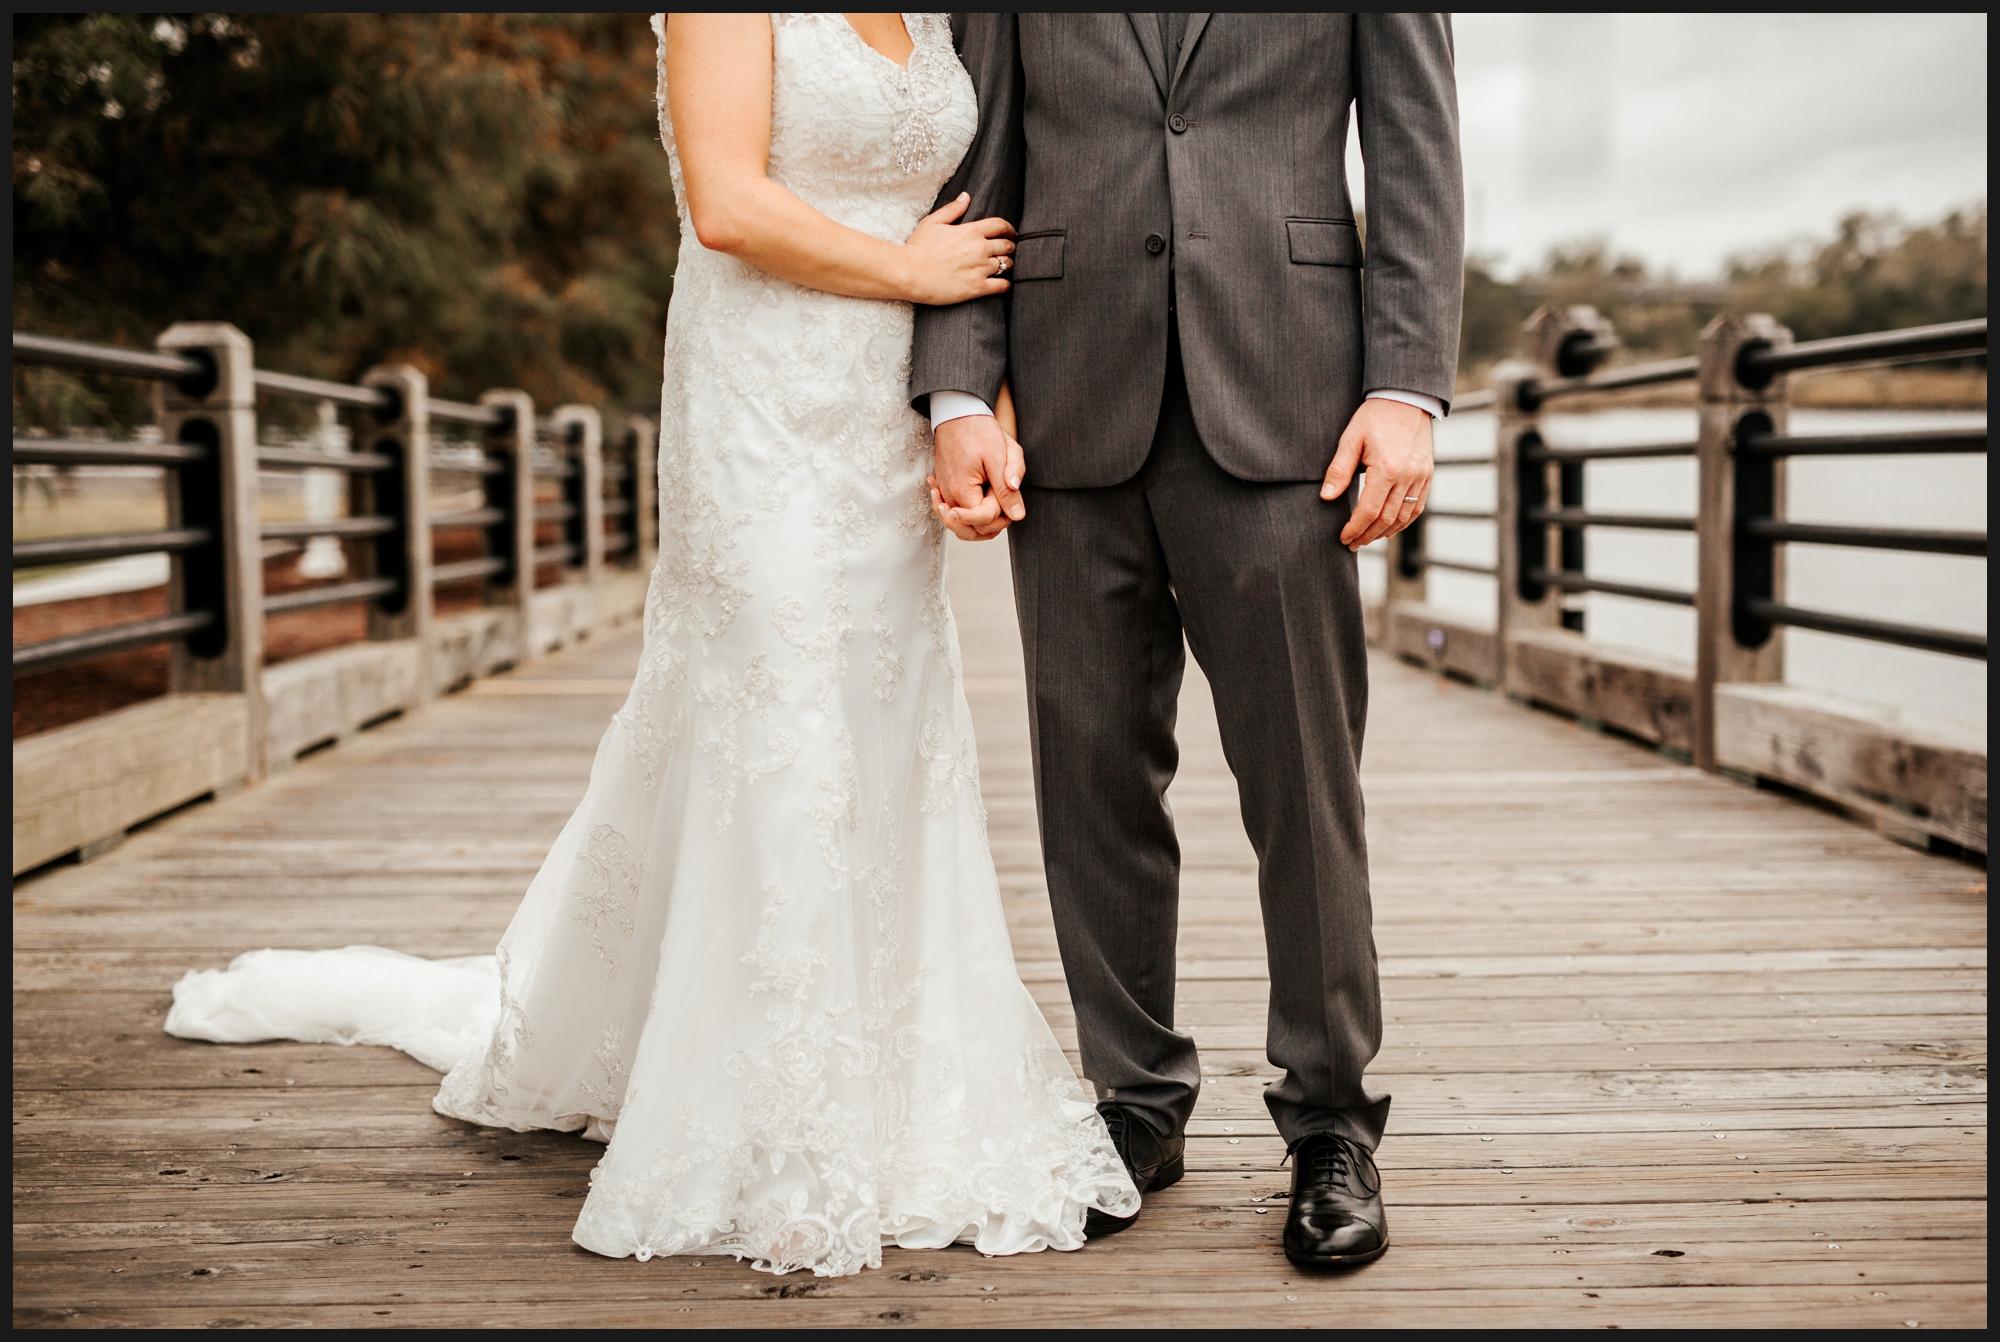 Orlando-Wedding-Photographer-destination-wedding-photographer-florida-wedding-photographer-bohemian-wedding-photographer_0642.jpg